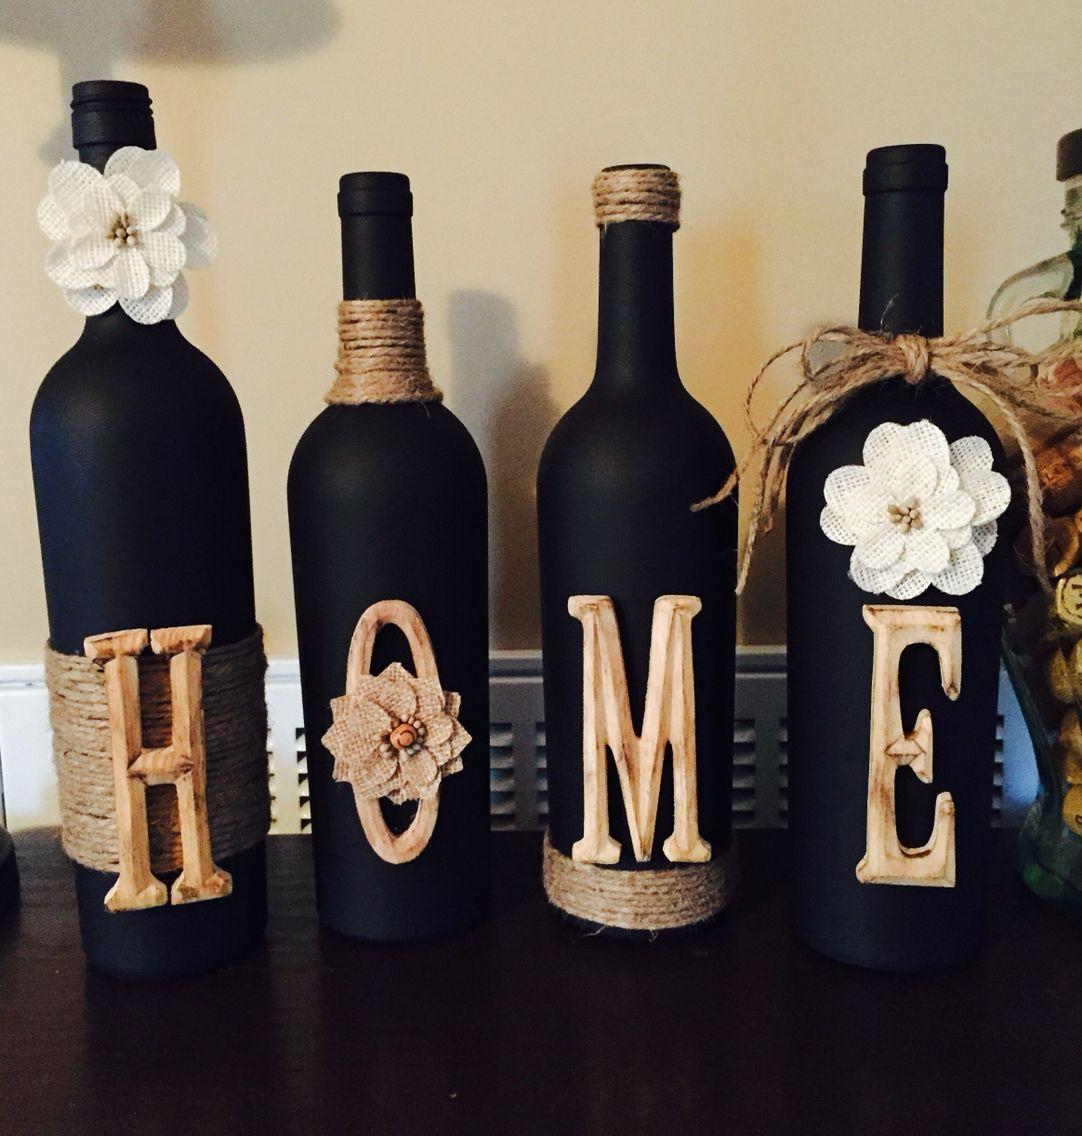 Bottle Home Craft Designs on baby craft designs, car craft designs, glass craft designs, plastic craft designs, german craft designs, beer can craft designs, letter d designs,